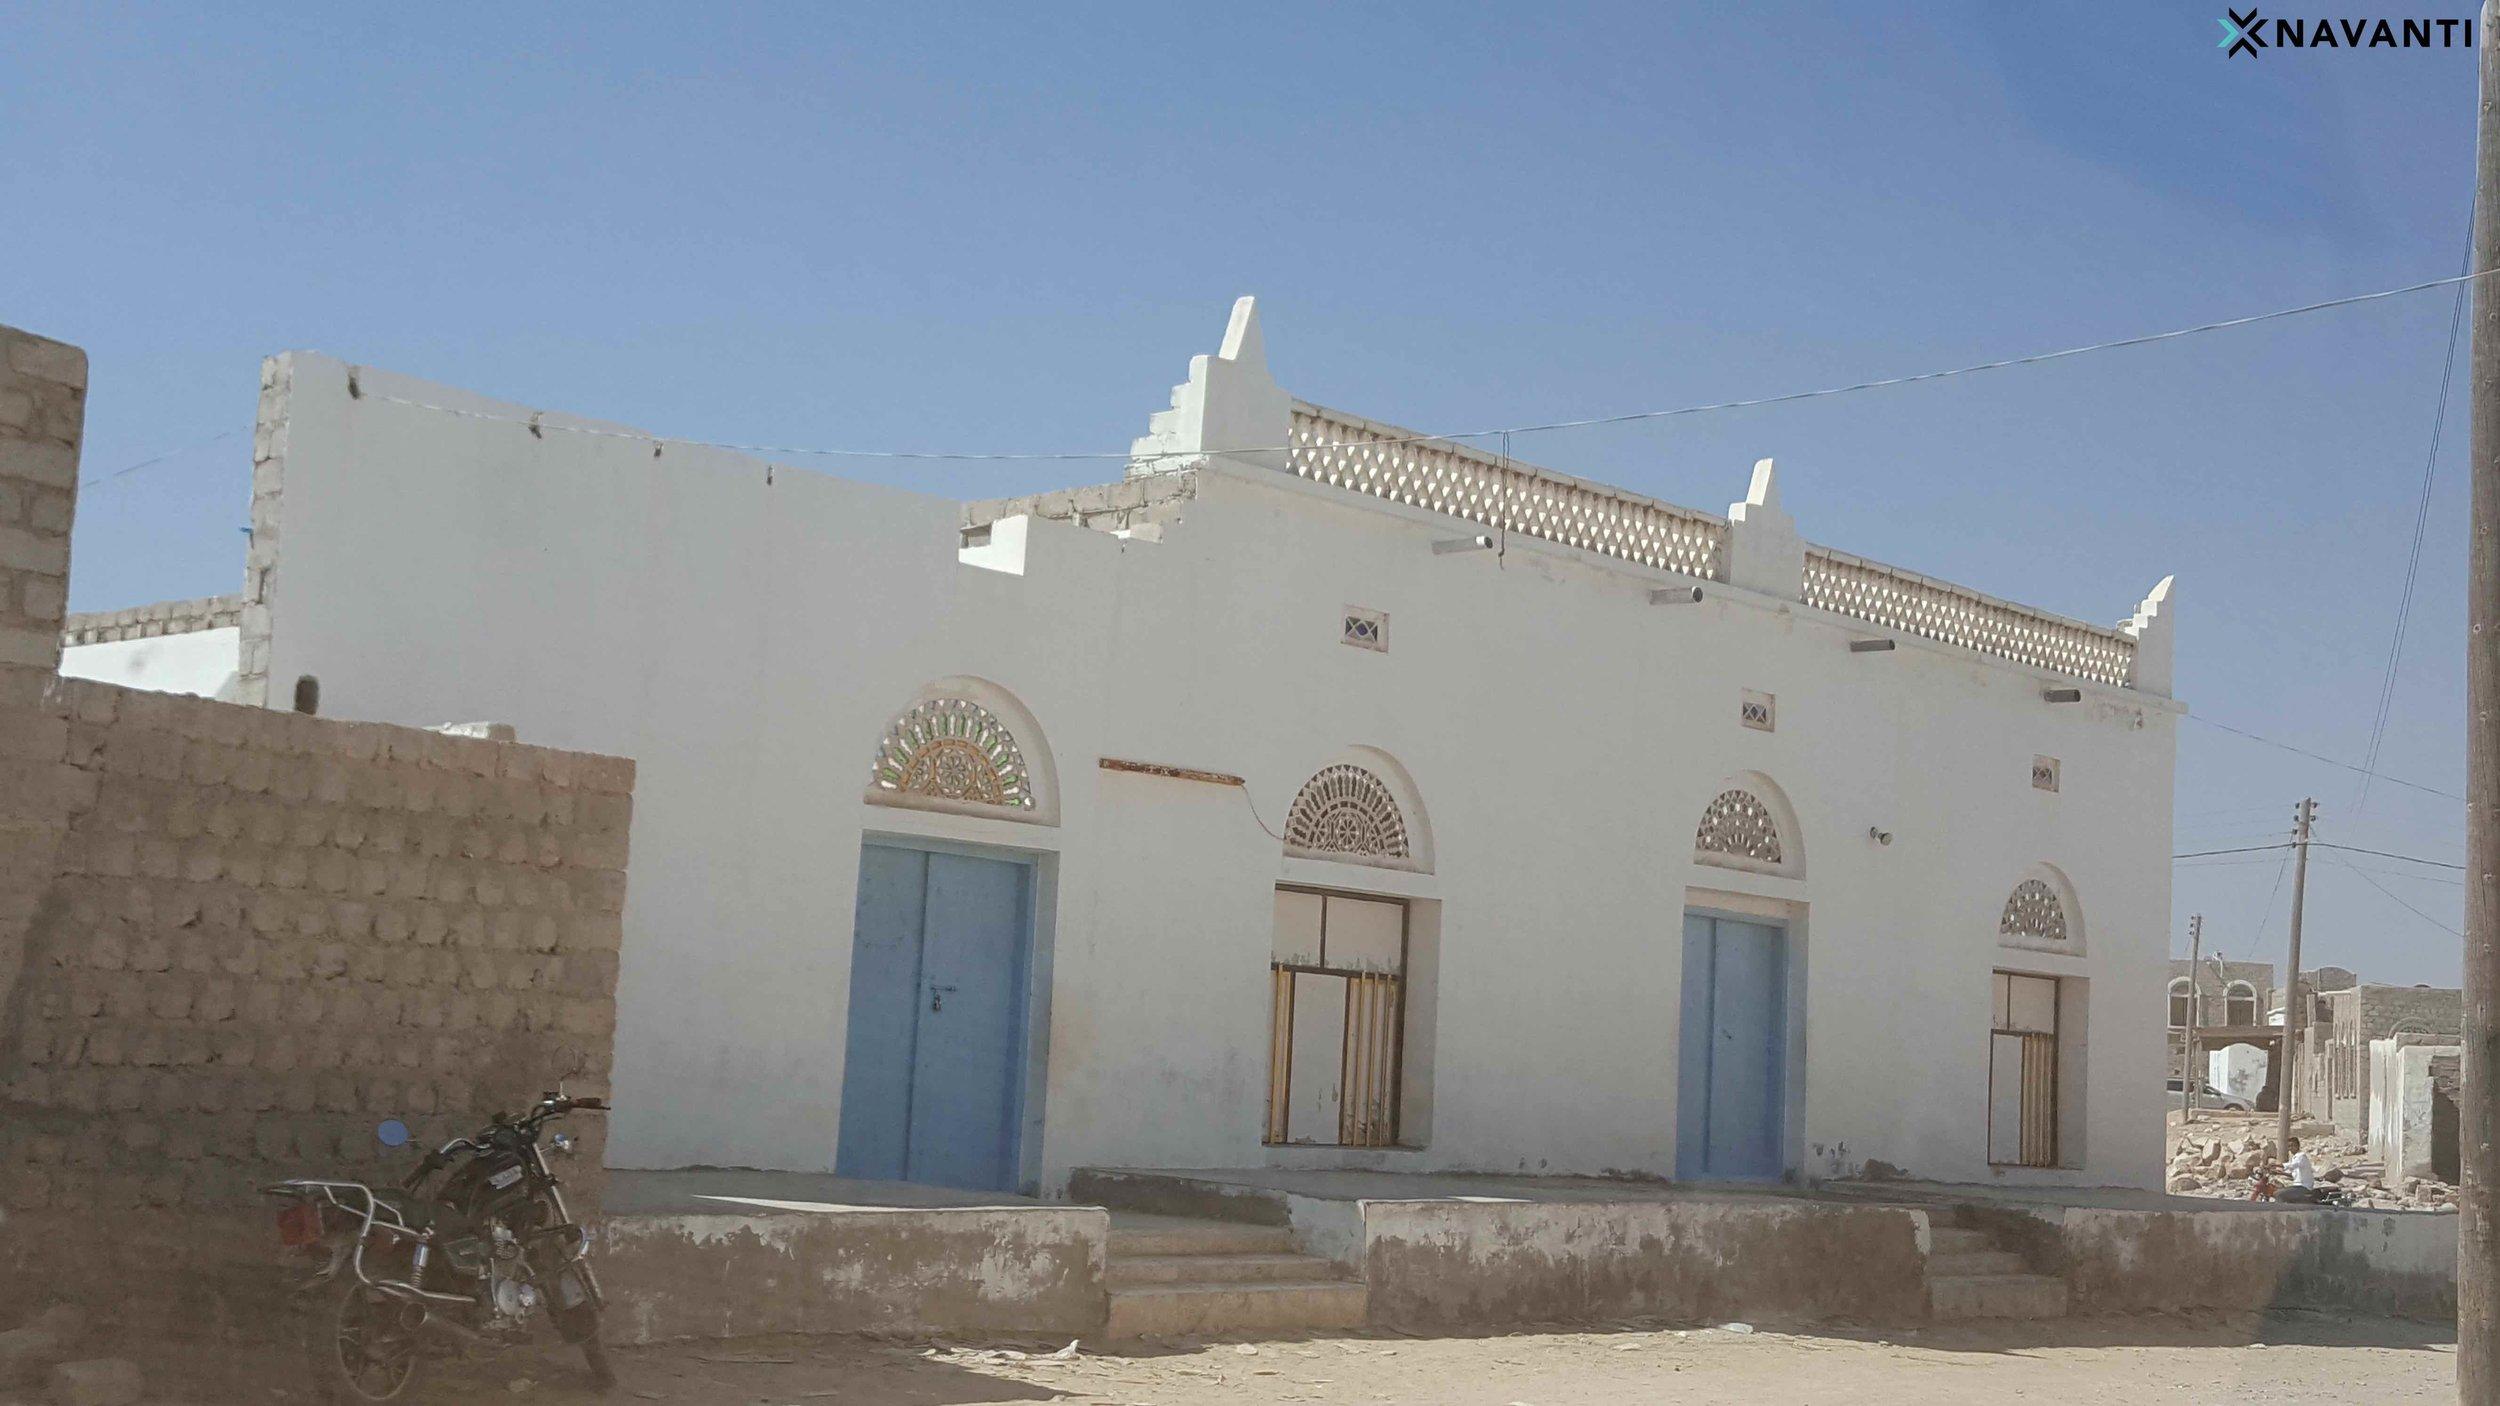 Historic Sufi mosque in Sayhut, al-Mahra. Source: Navanti